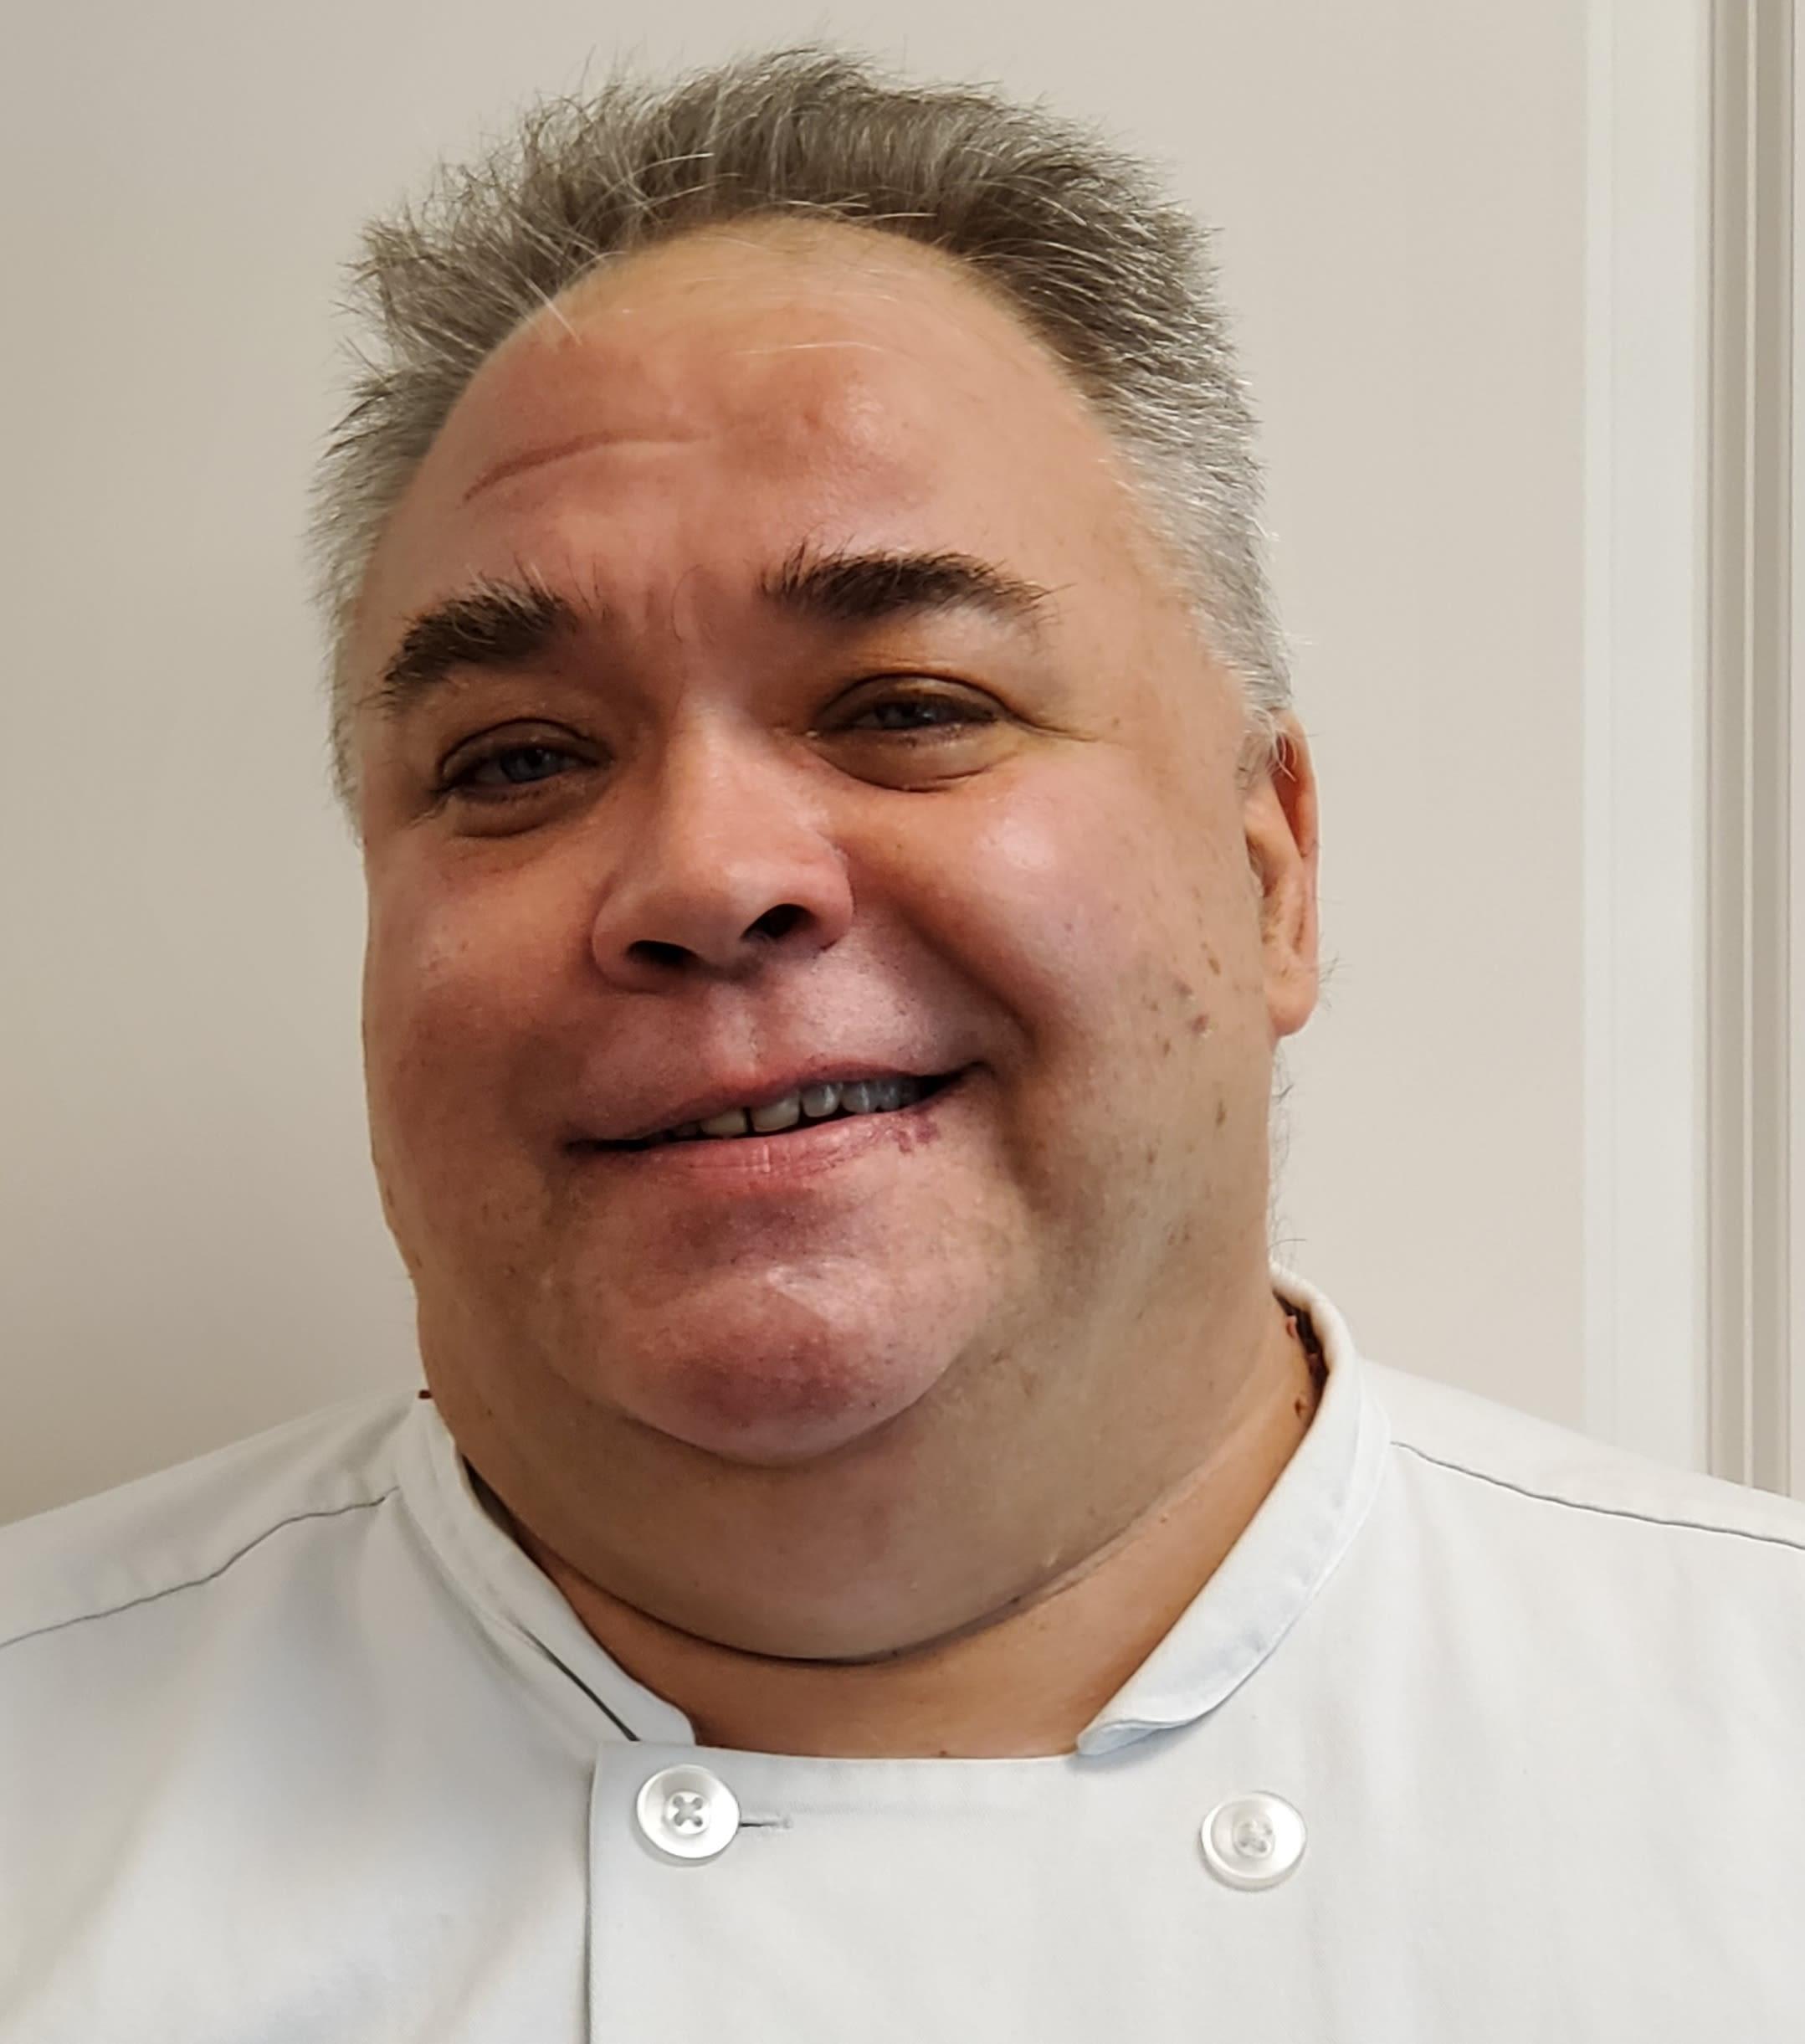 Robert Bruneman Dining Services Director